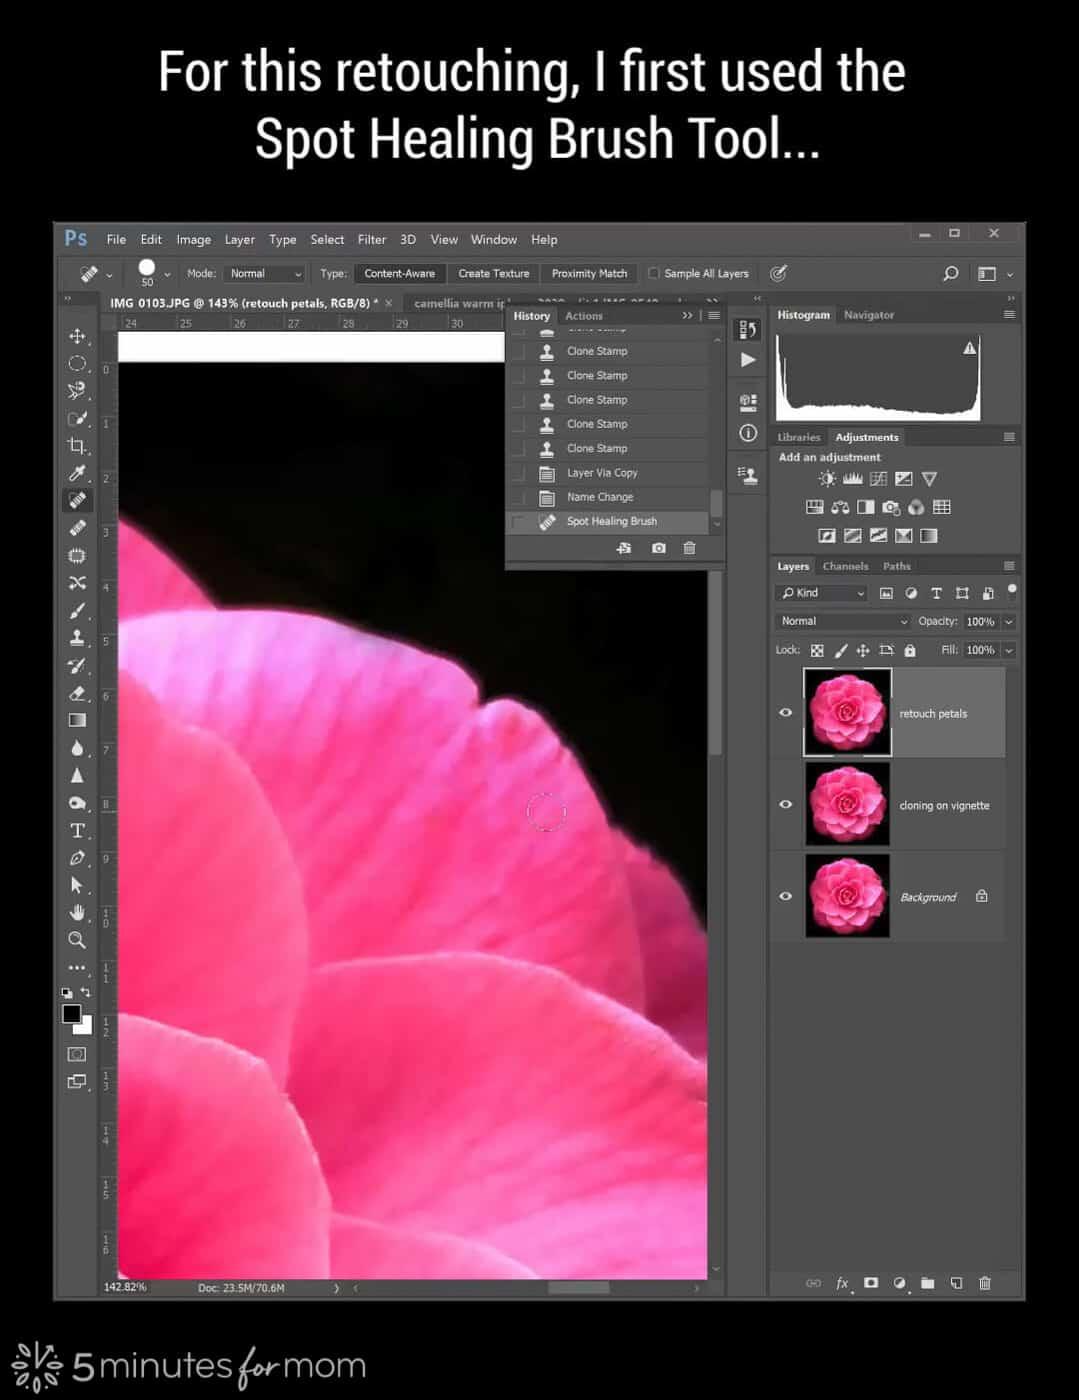 spot healing brush tool in Photoshop